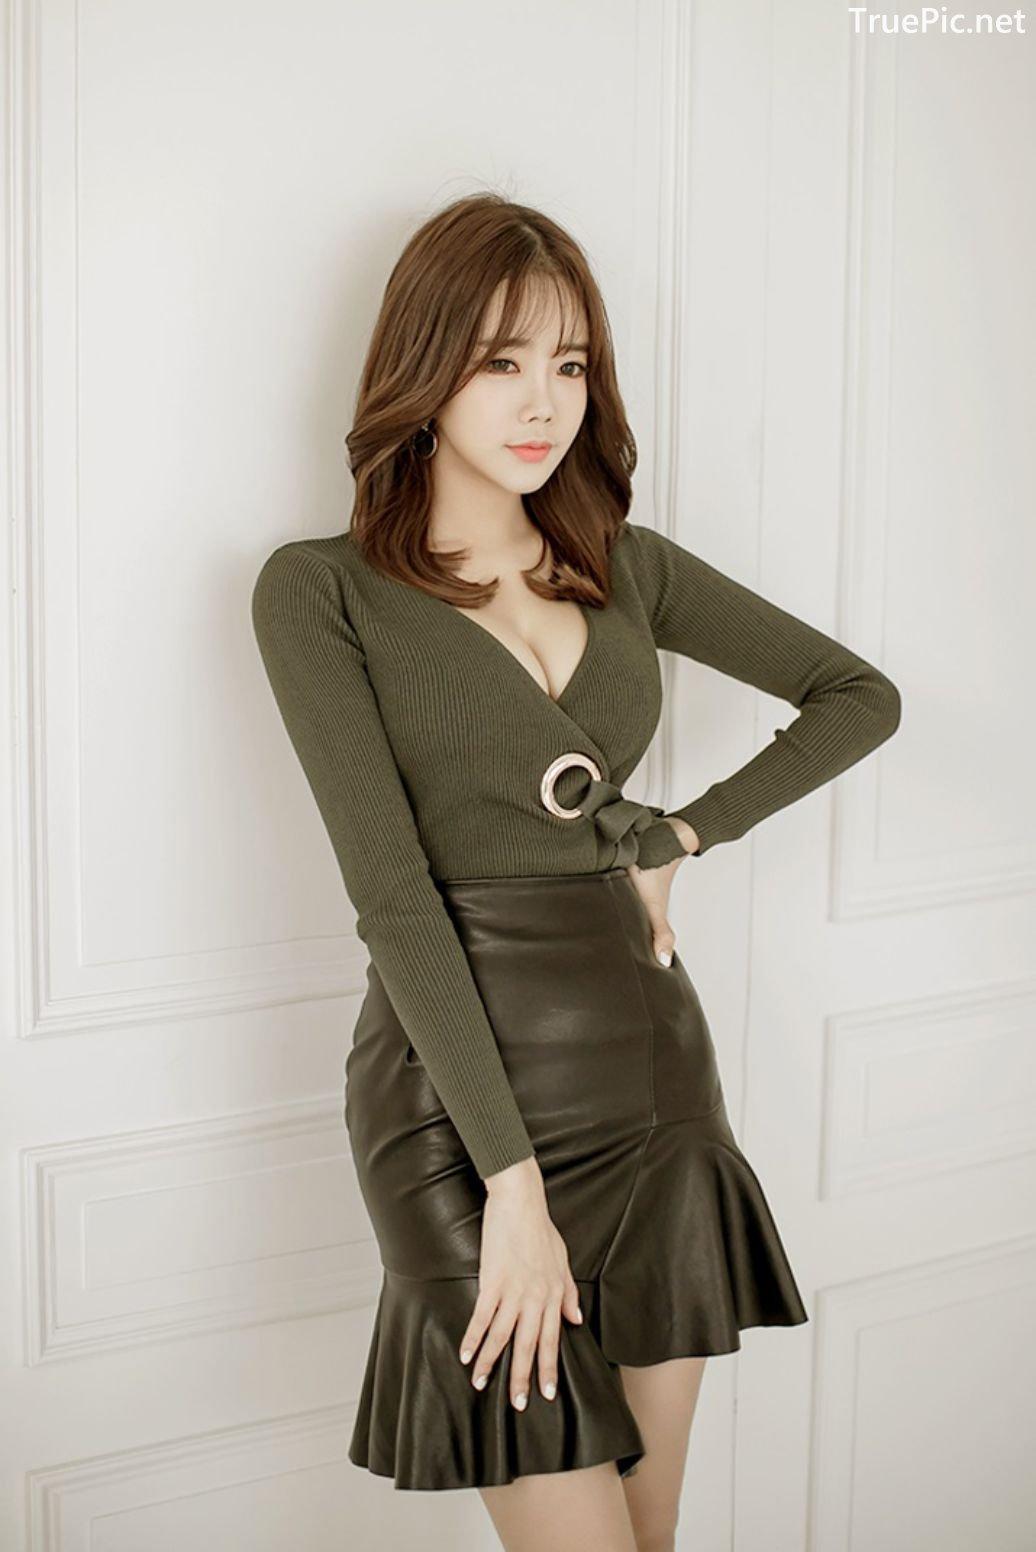 Image-Korean-Fashion-Model–Kang-Eun-Wook–Indoor-Photoshoot-Collection-2-TruePic.net- Picture-7